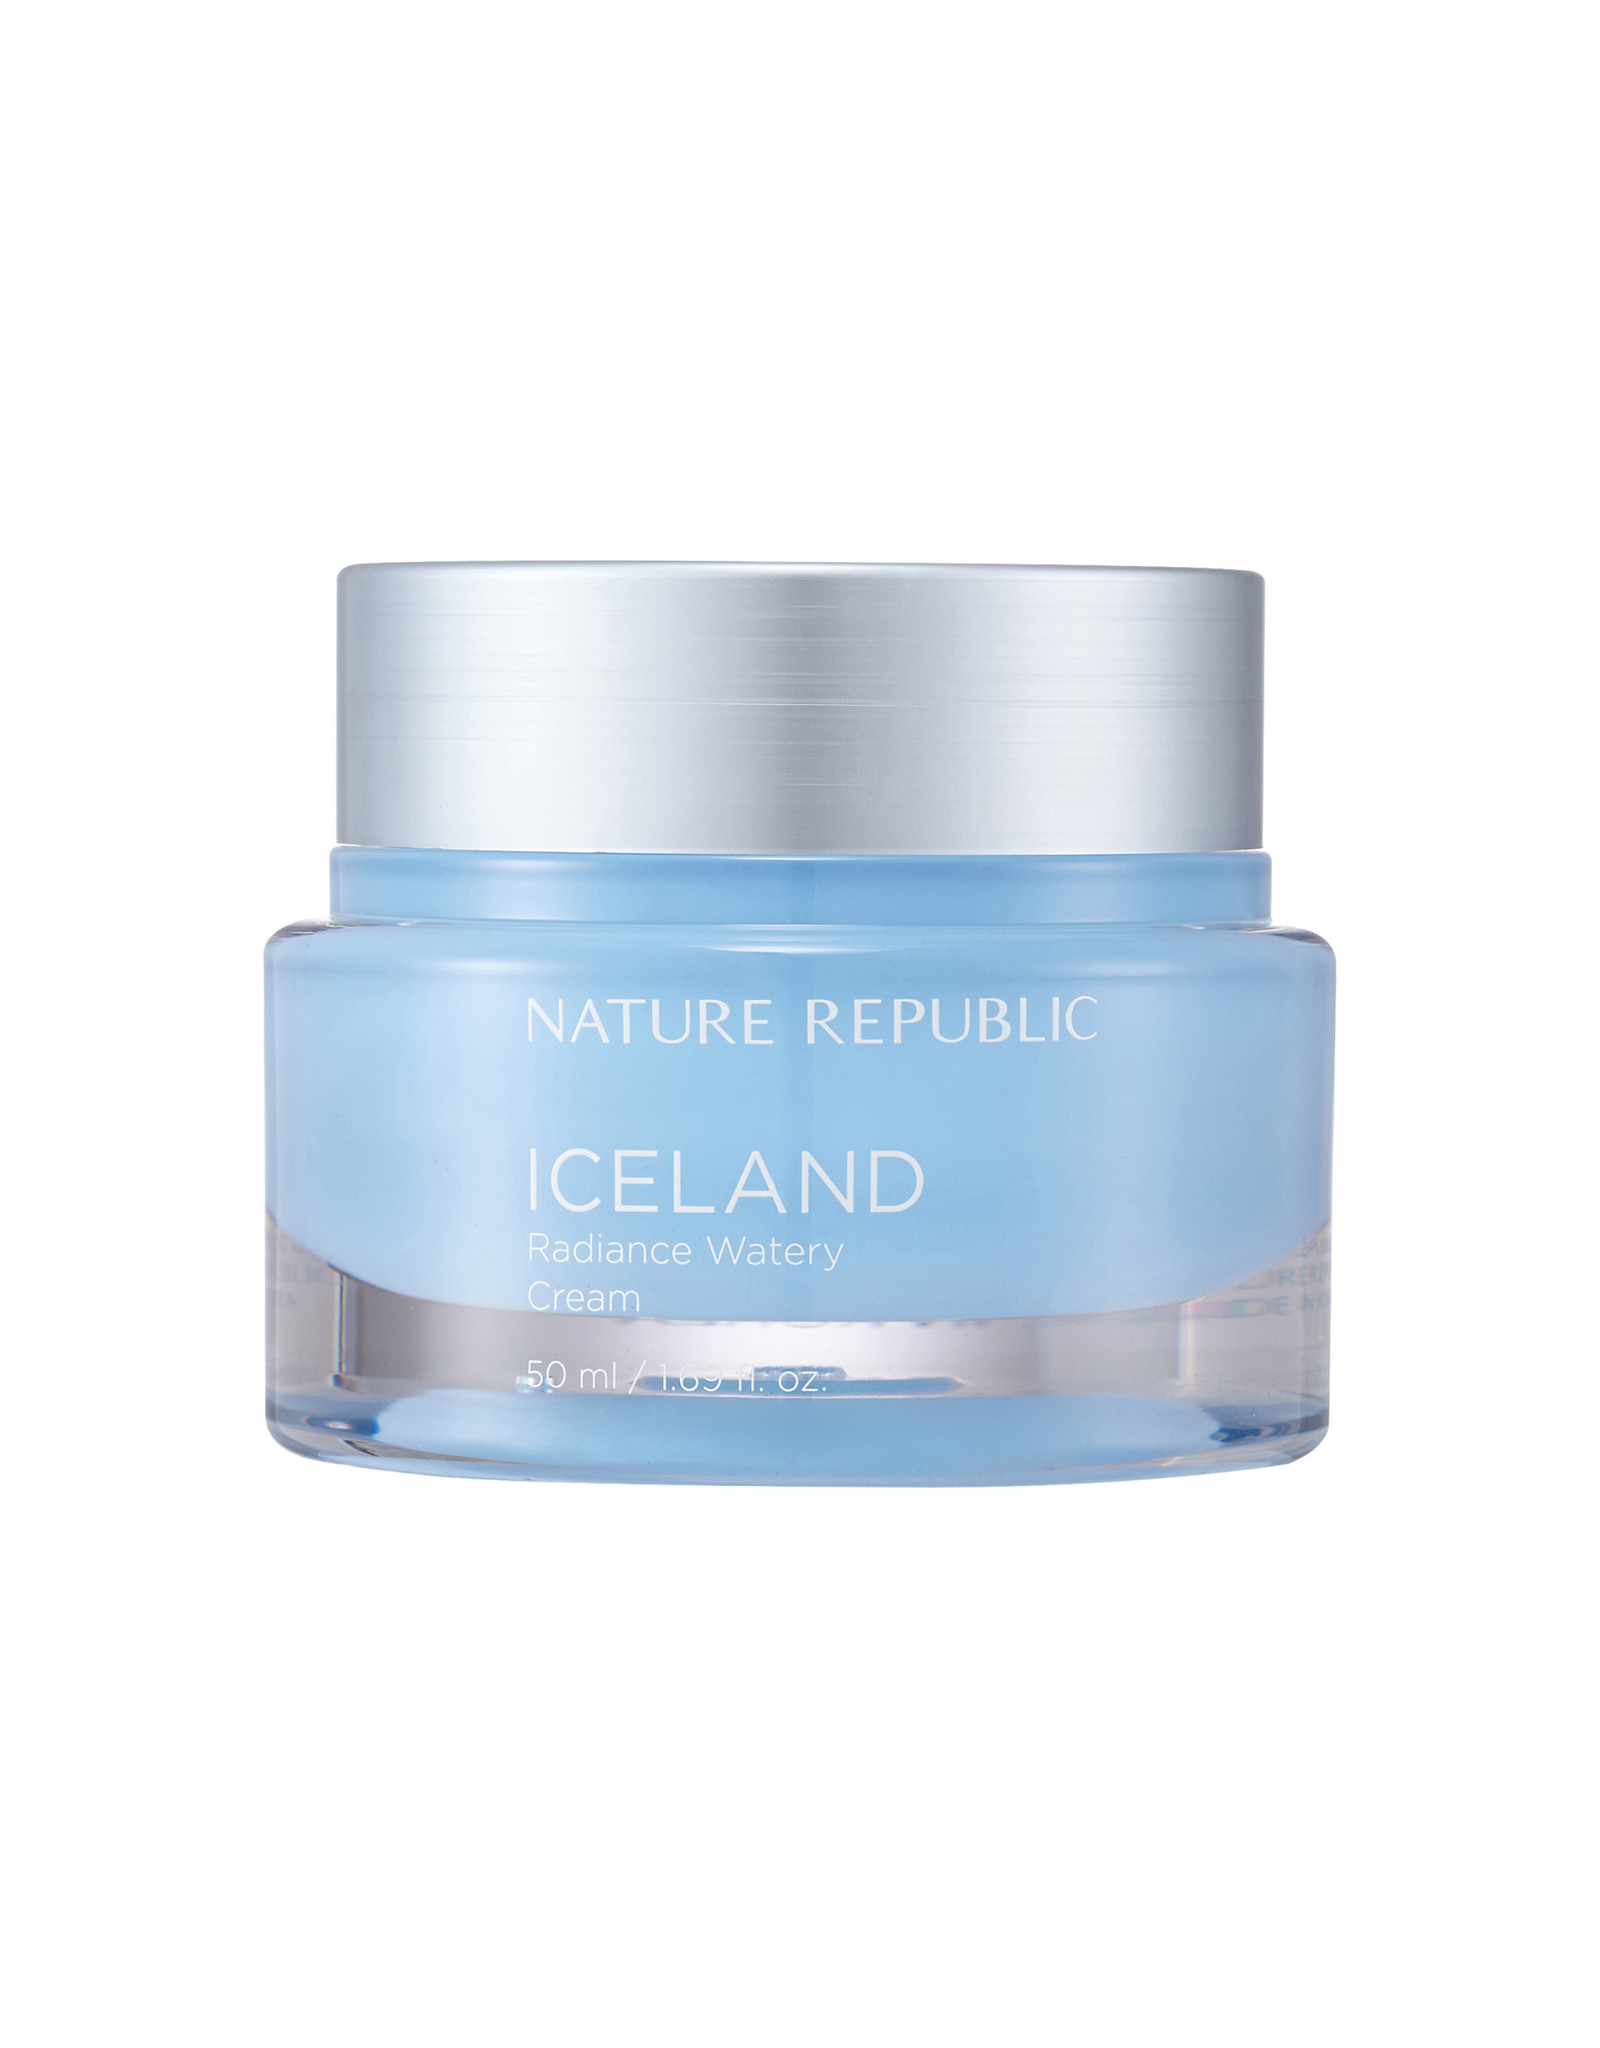 Iceland Radiance Watery Cream